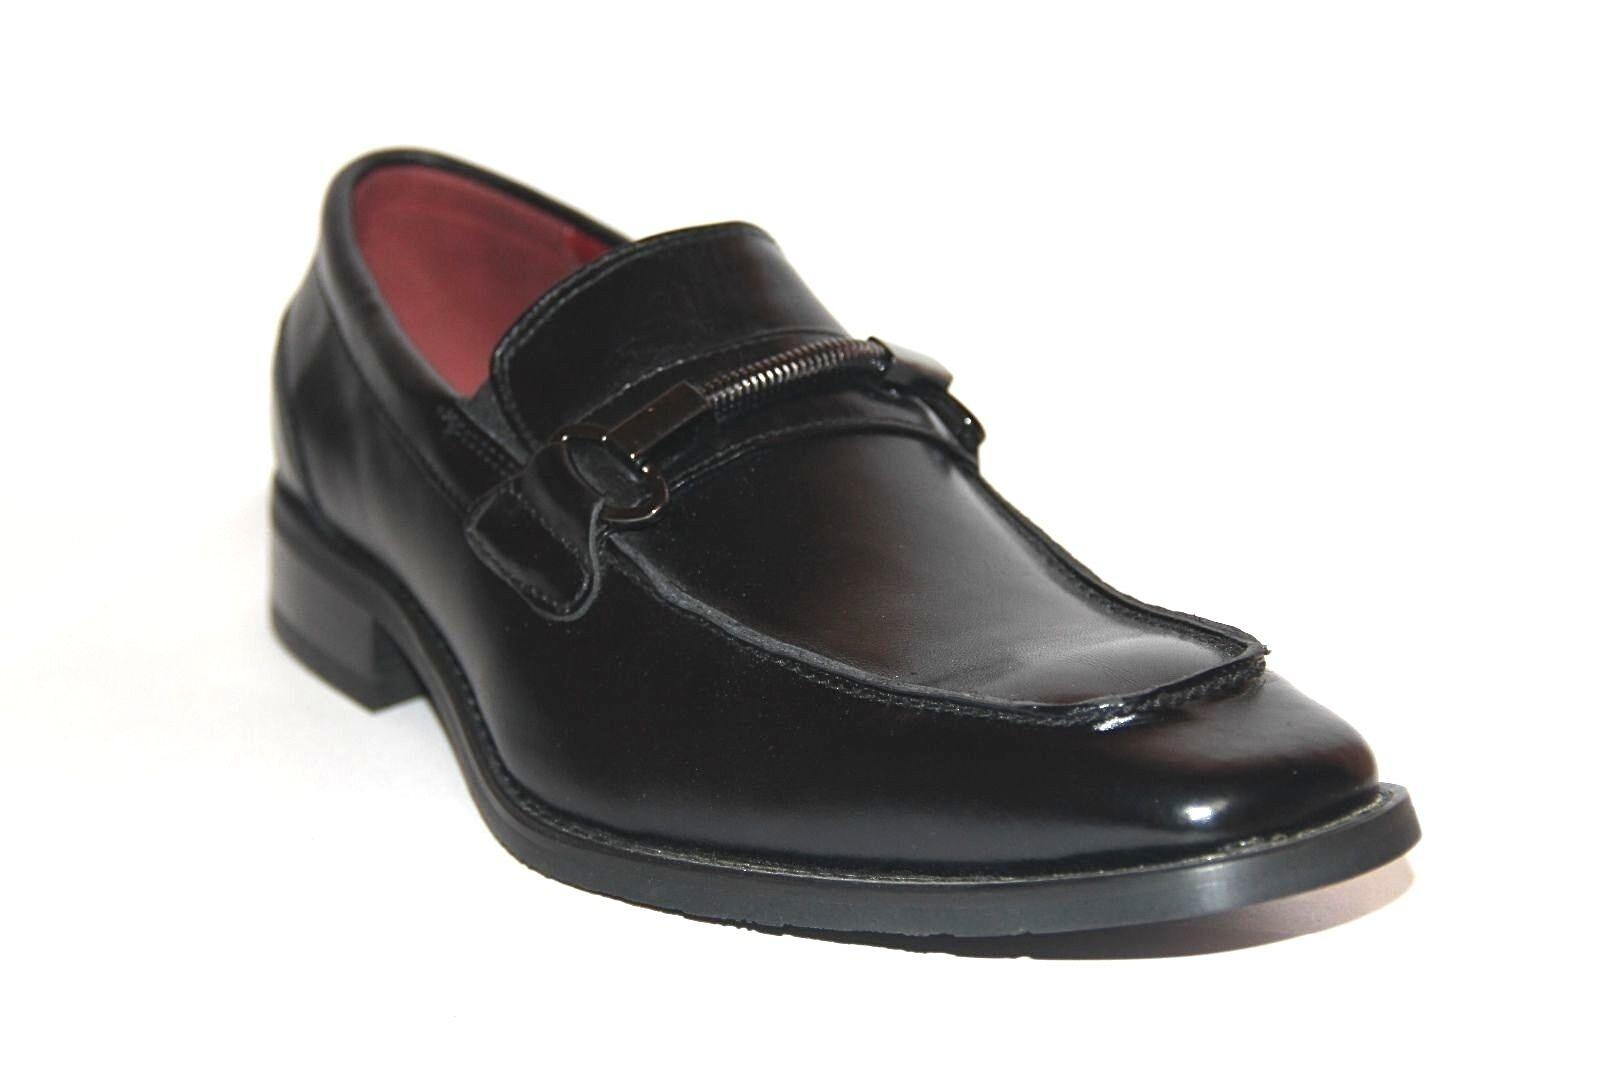 NXT MEN'S SLIP ON SHOES BLACK LEATHER DRESS LOAFER SHOES ON  N2723 c36c6f